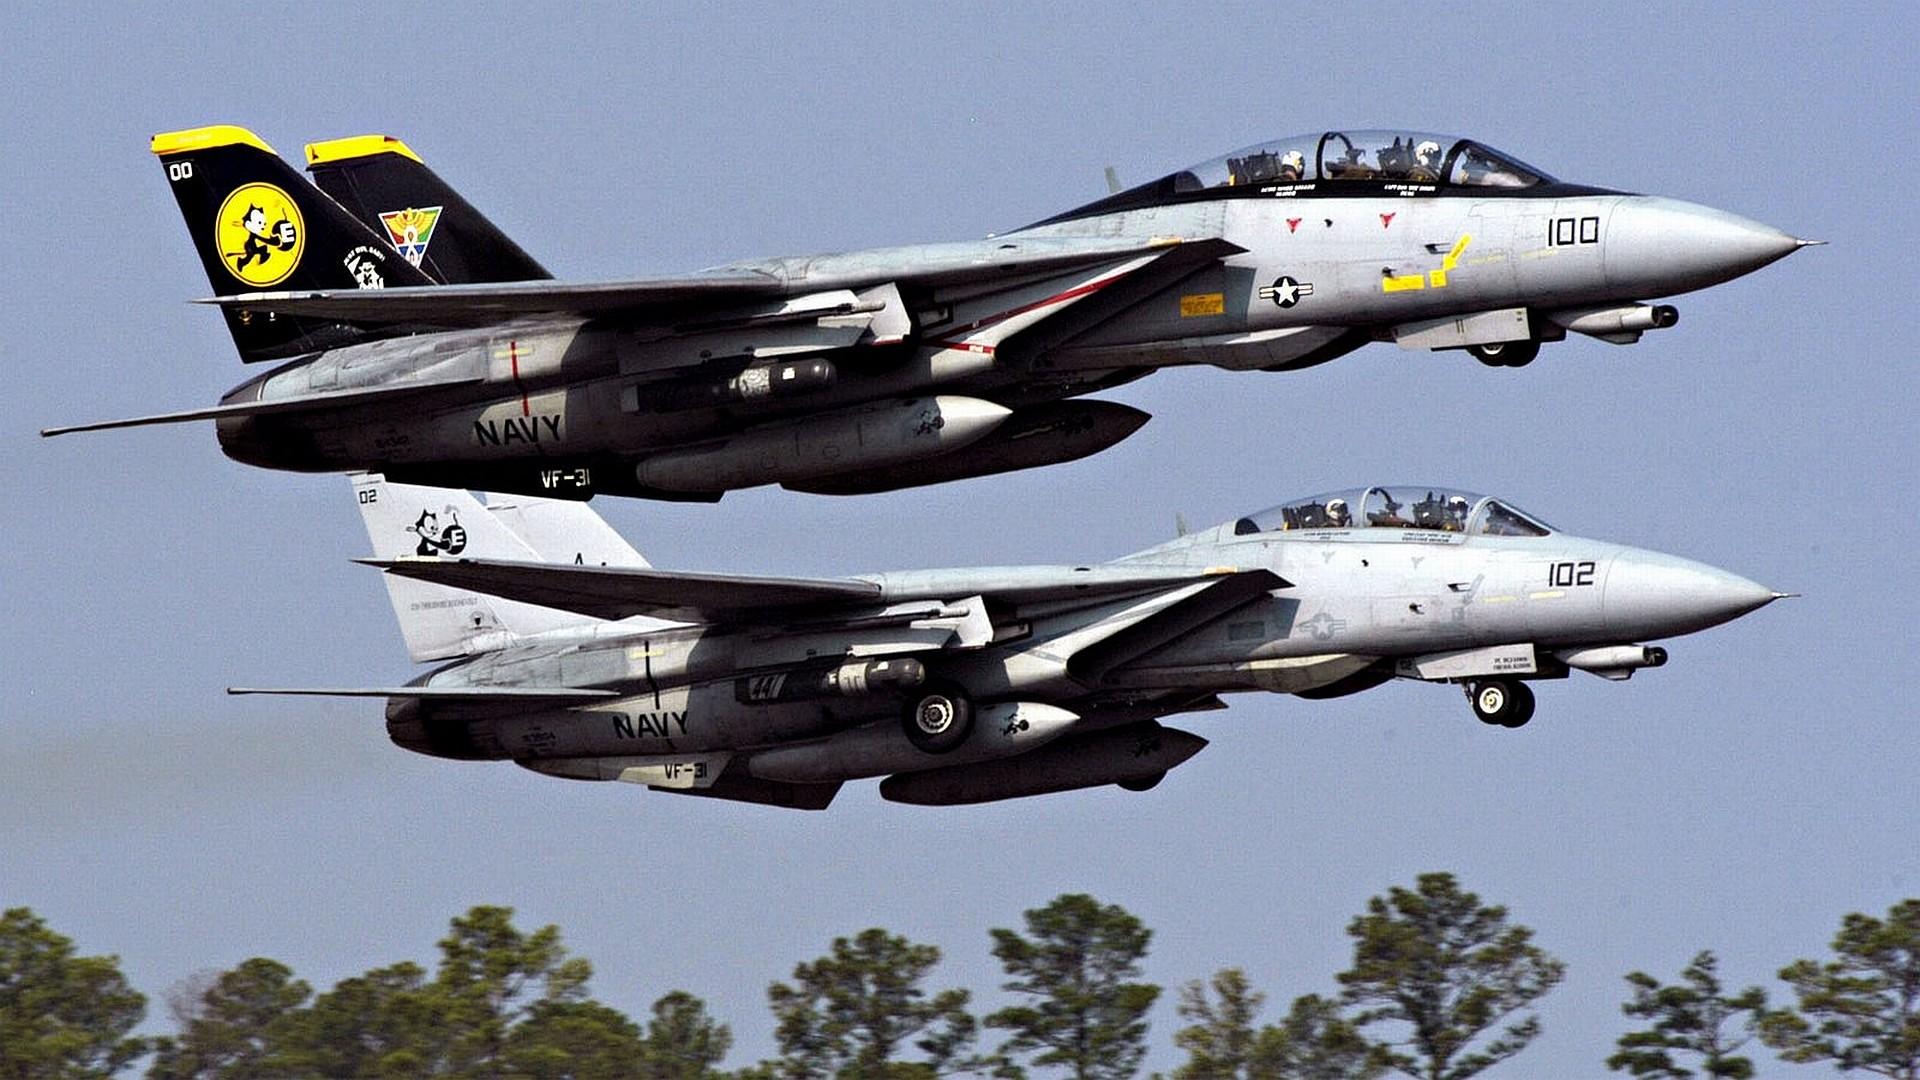 14 tomcat jet fighter - photo #28